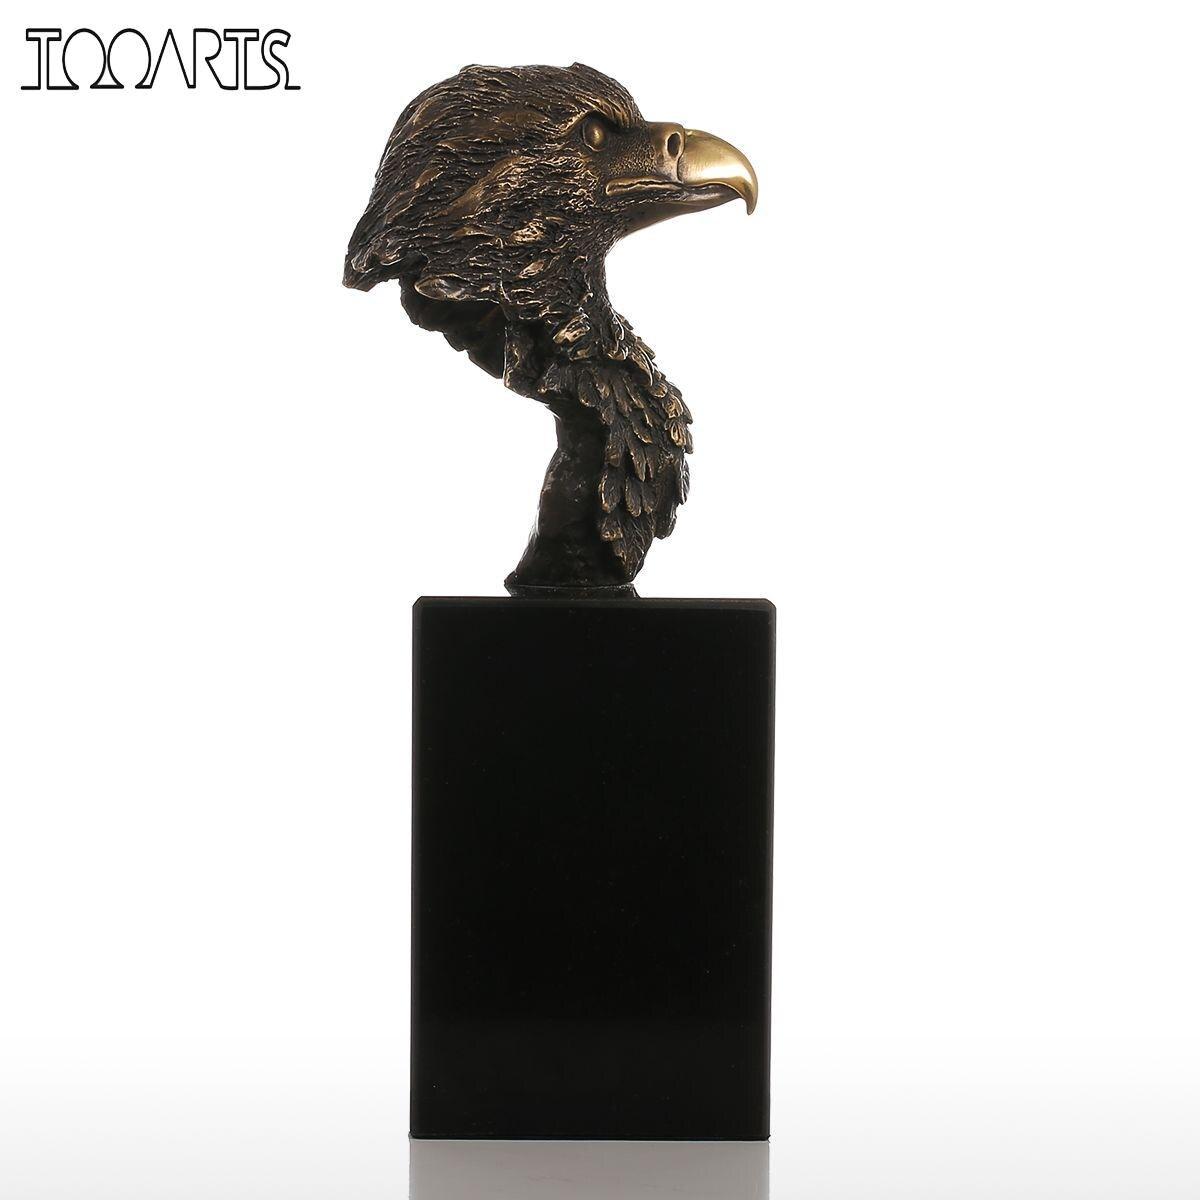 compare prices on bronze sculpture modern online shoppingbuy low  - tooarts sculpture marble base eagle hawk handmade bronze sculpture modernart home decor statue figurine gift